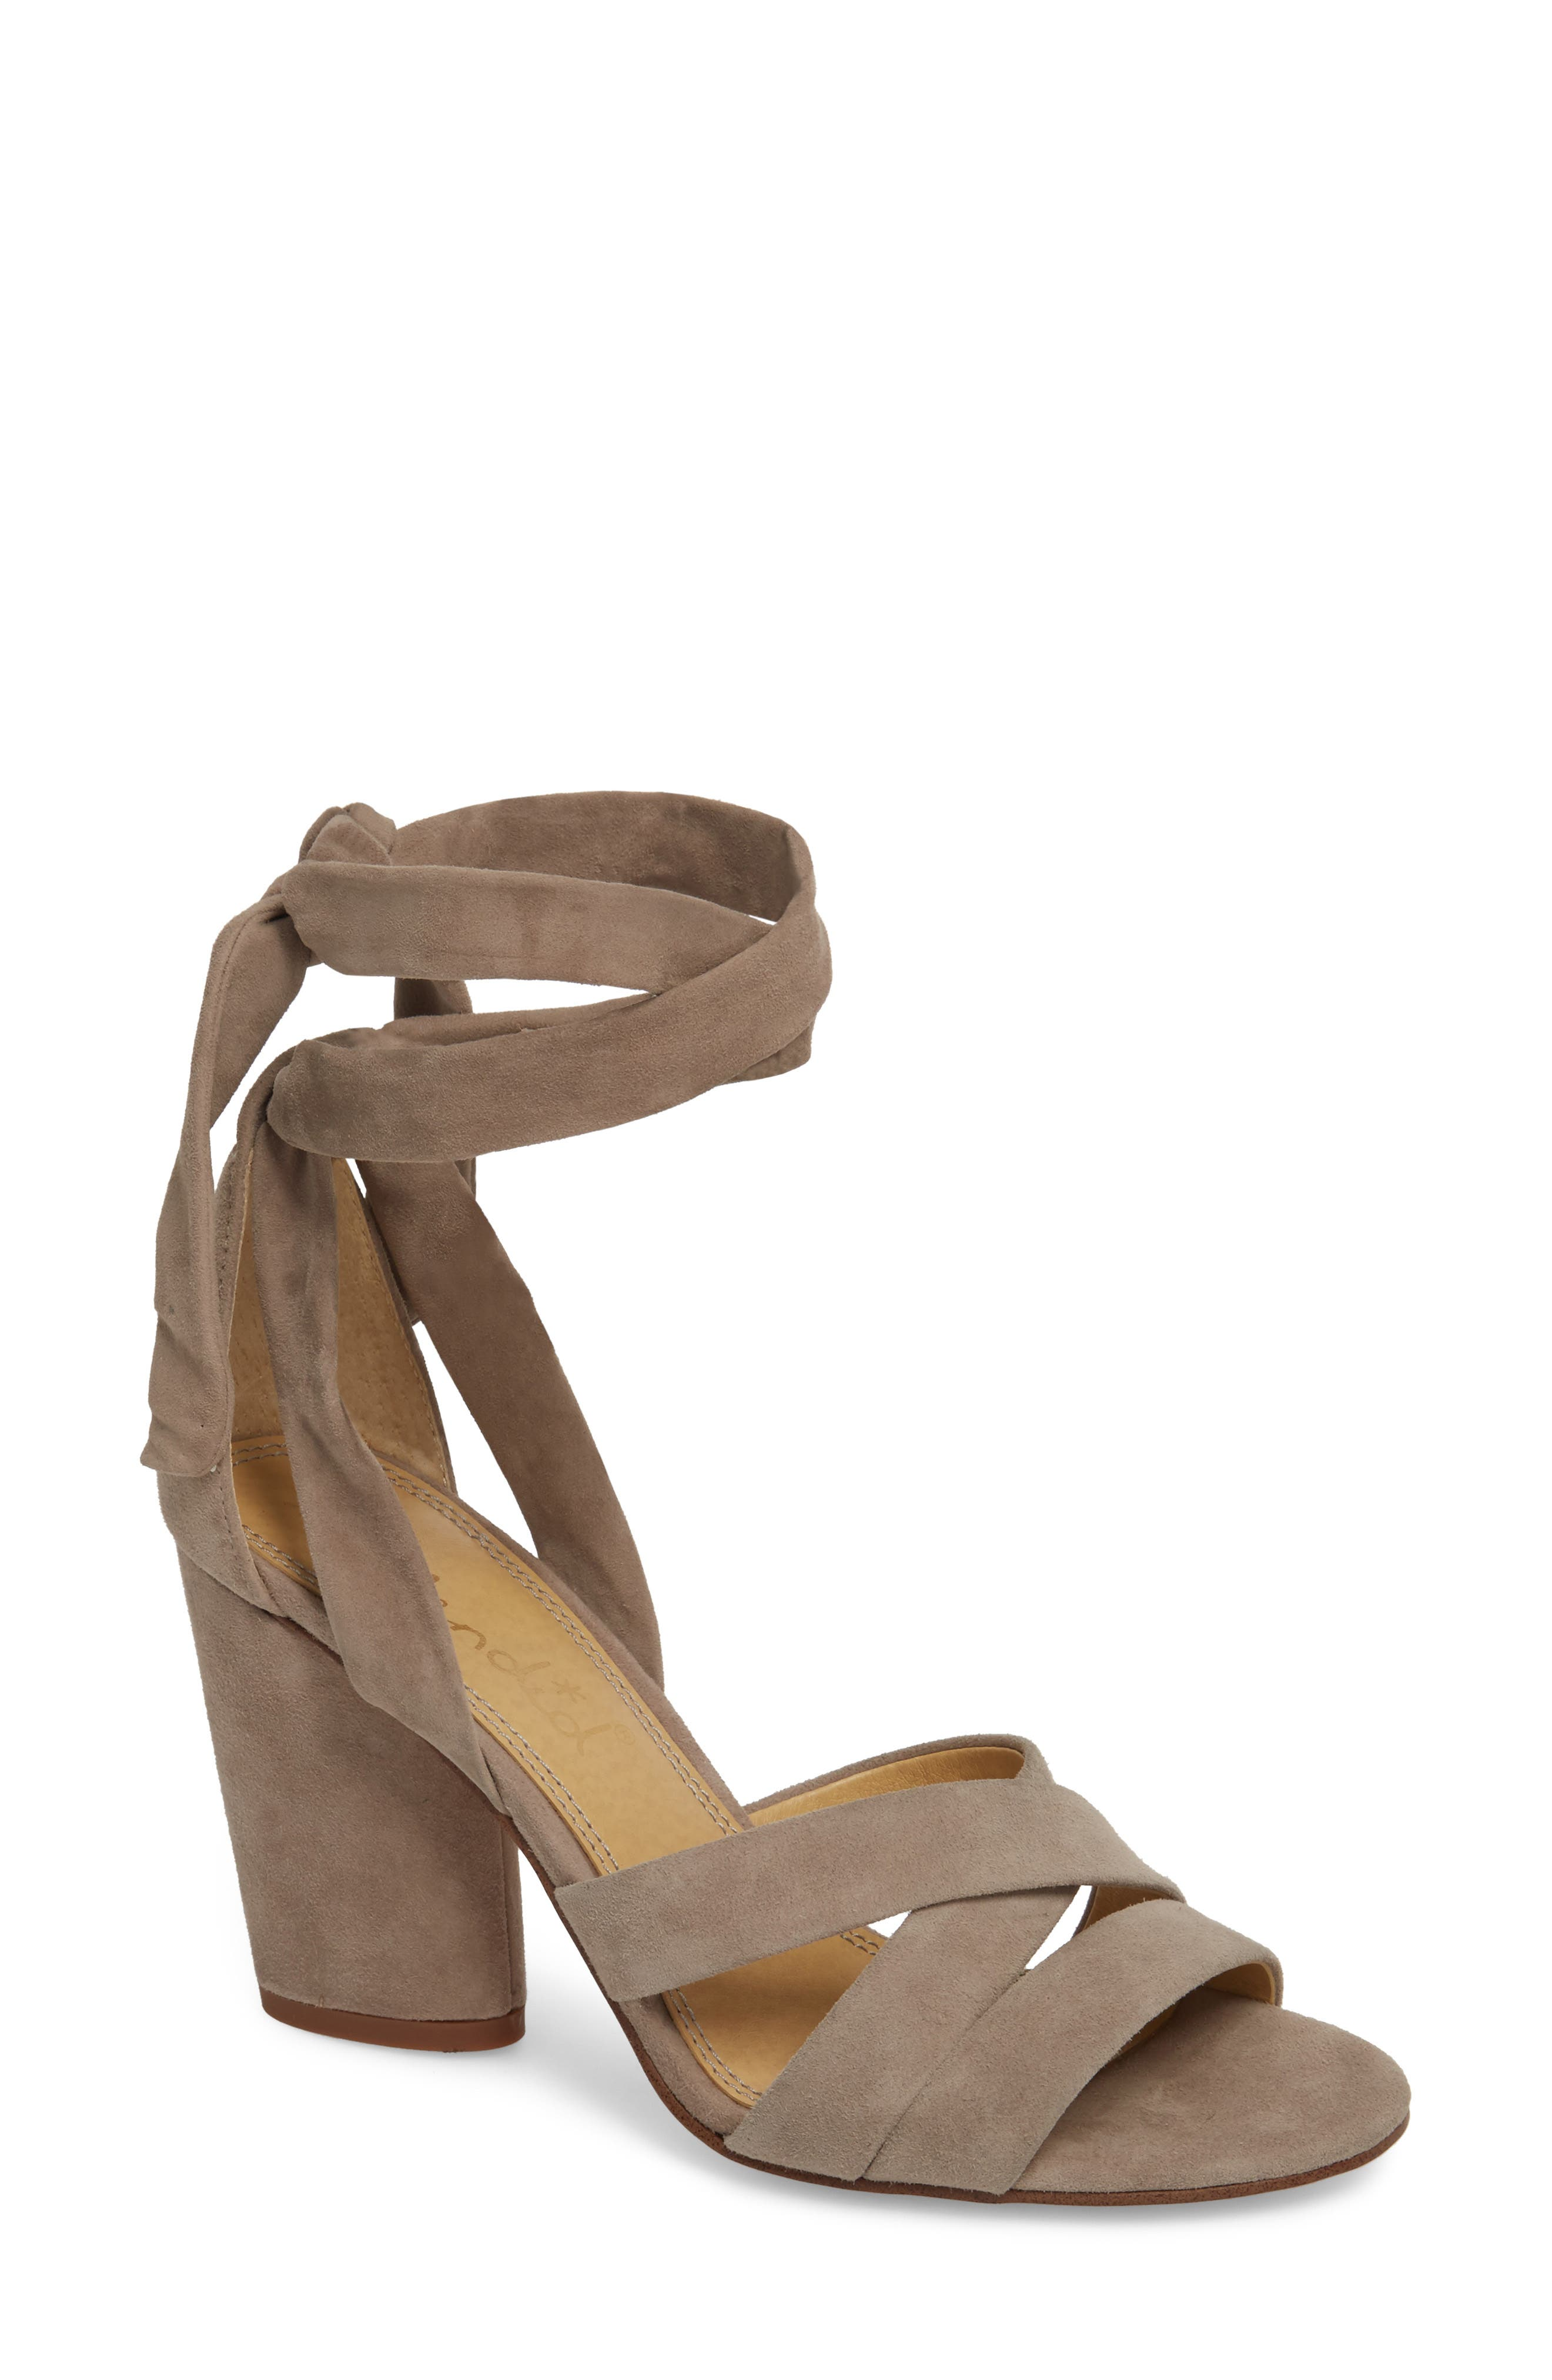 Fergie Lace-Up Sandal,                             Main thumbnail 1, color,                             Taupe Suede